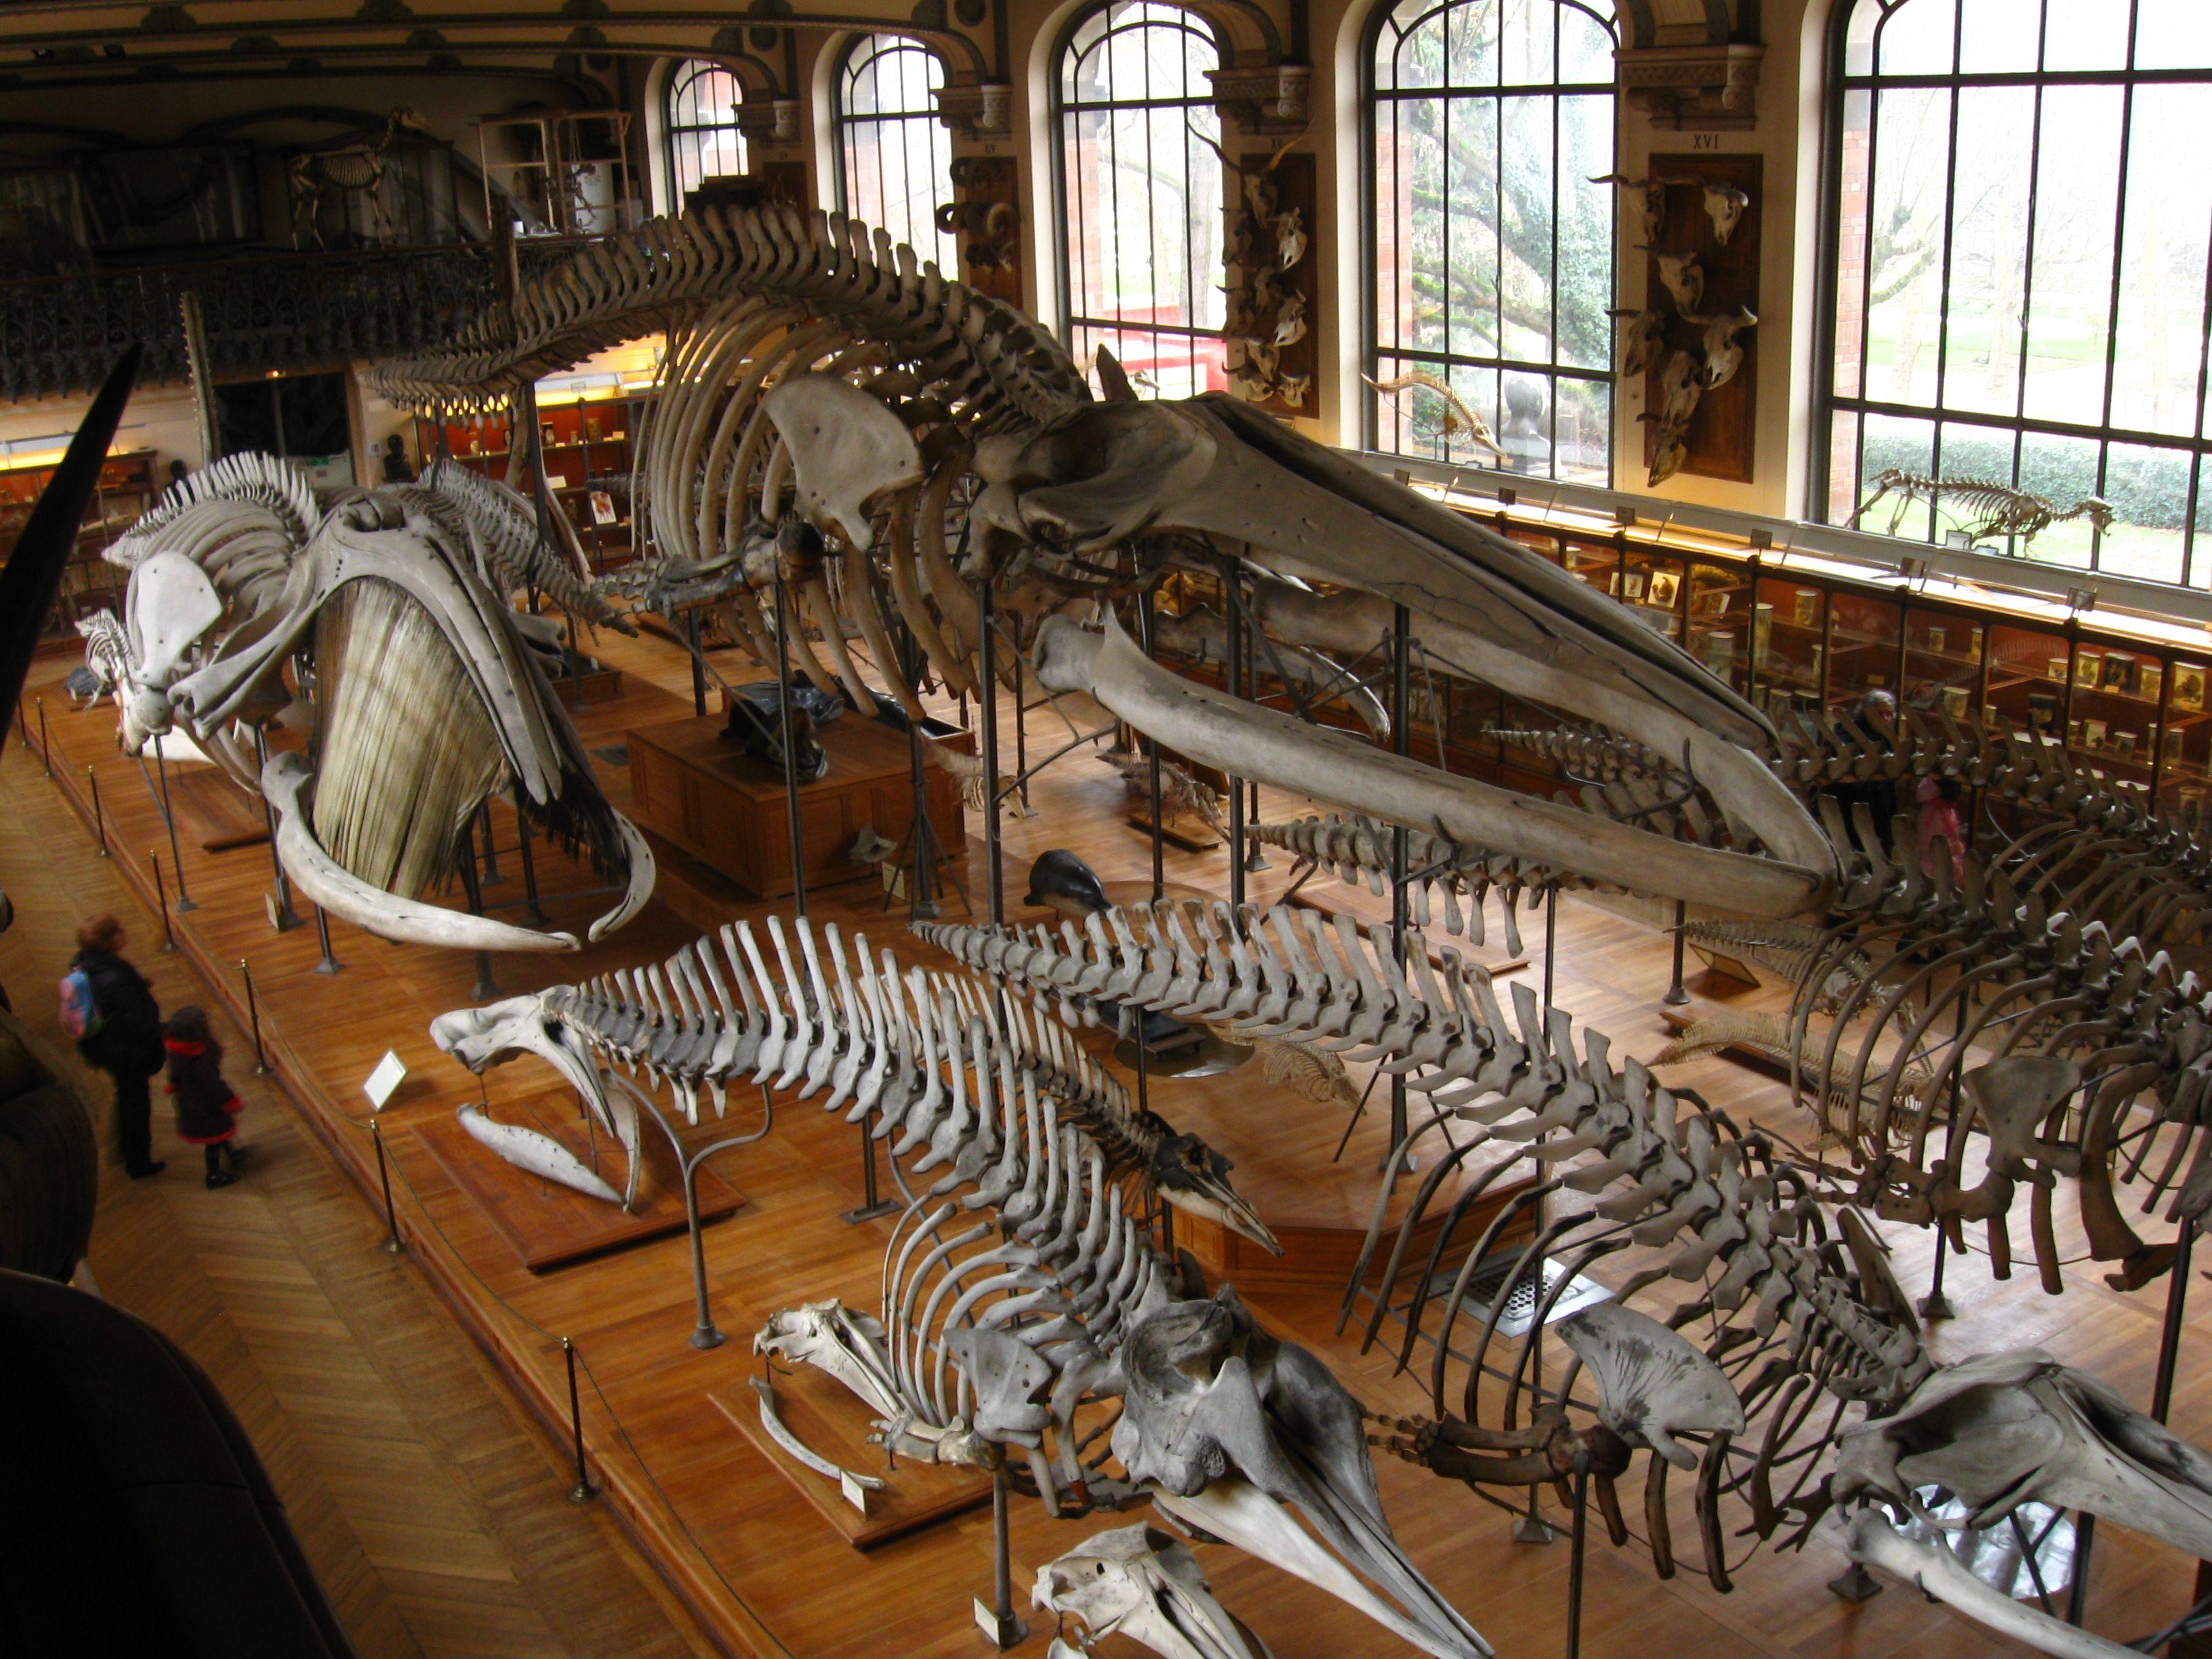 natural history museum paris - Google Search | 02 / art / nature ...